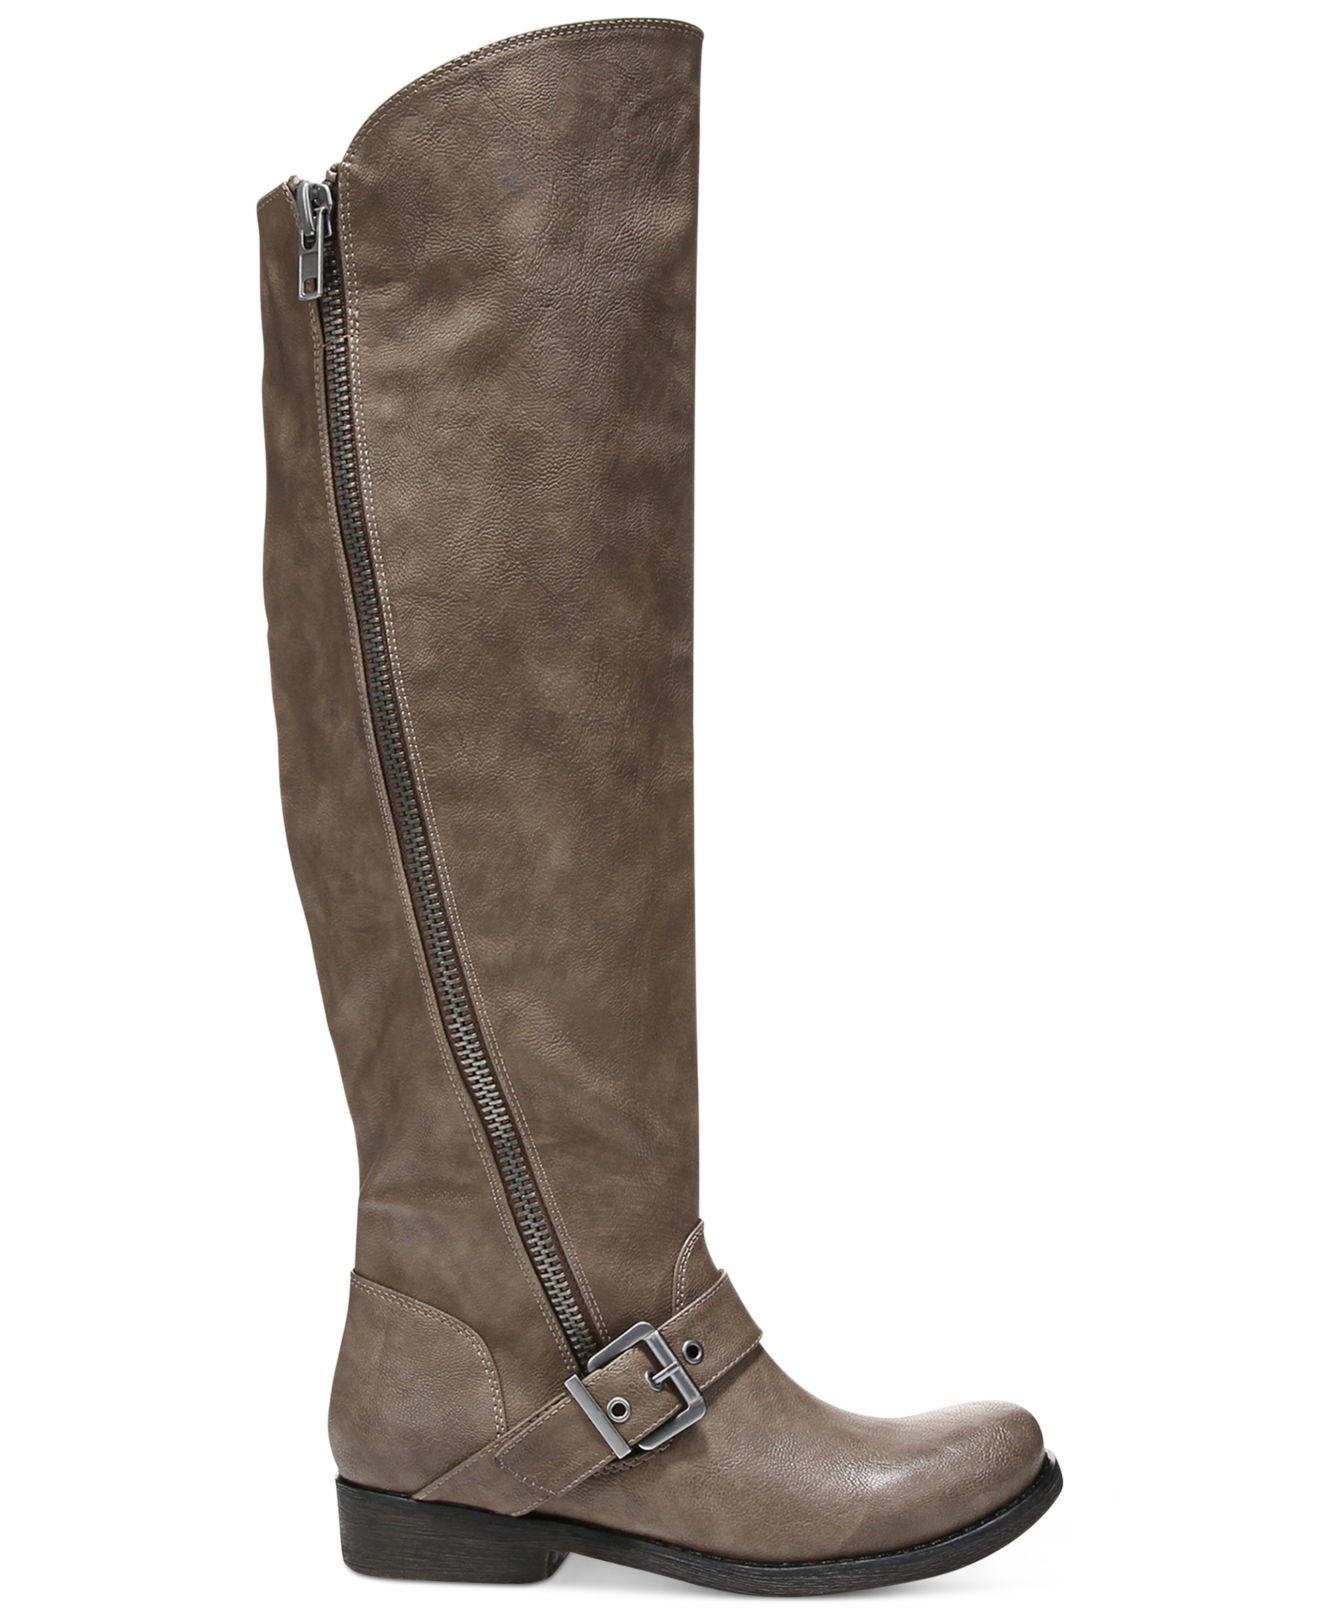 carlos by carlos santana gramercy boots in brown